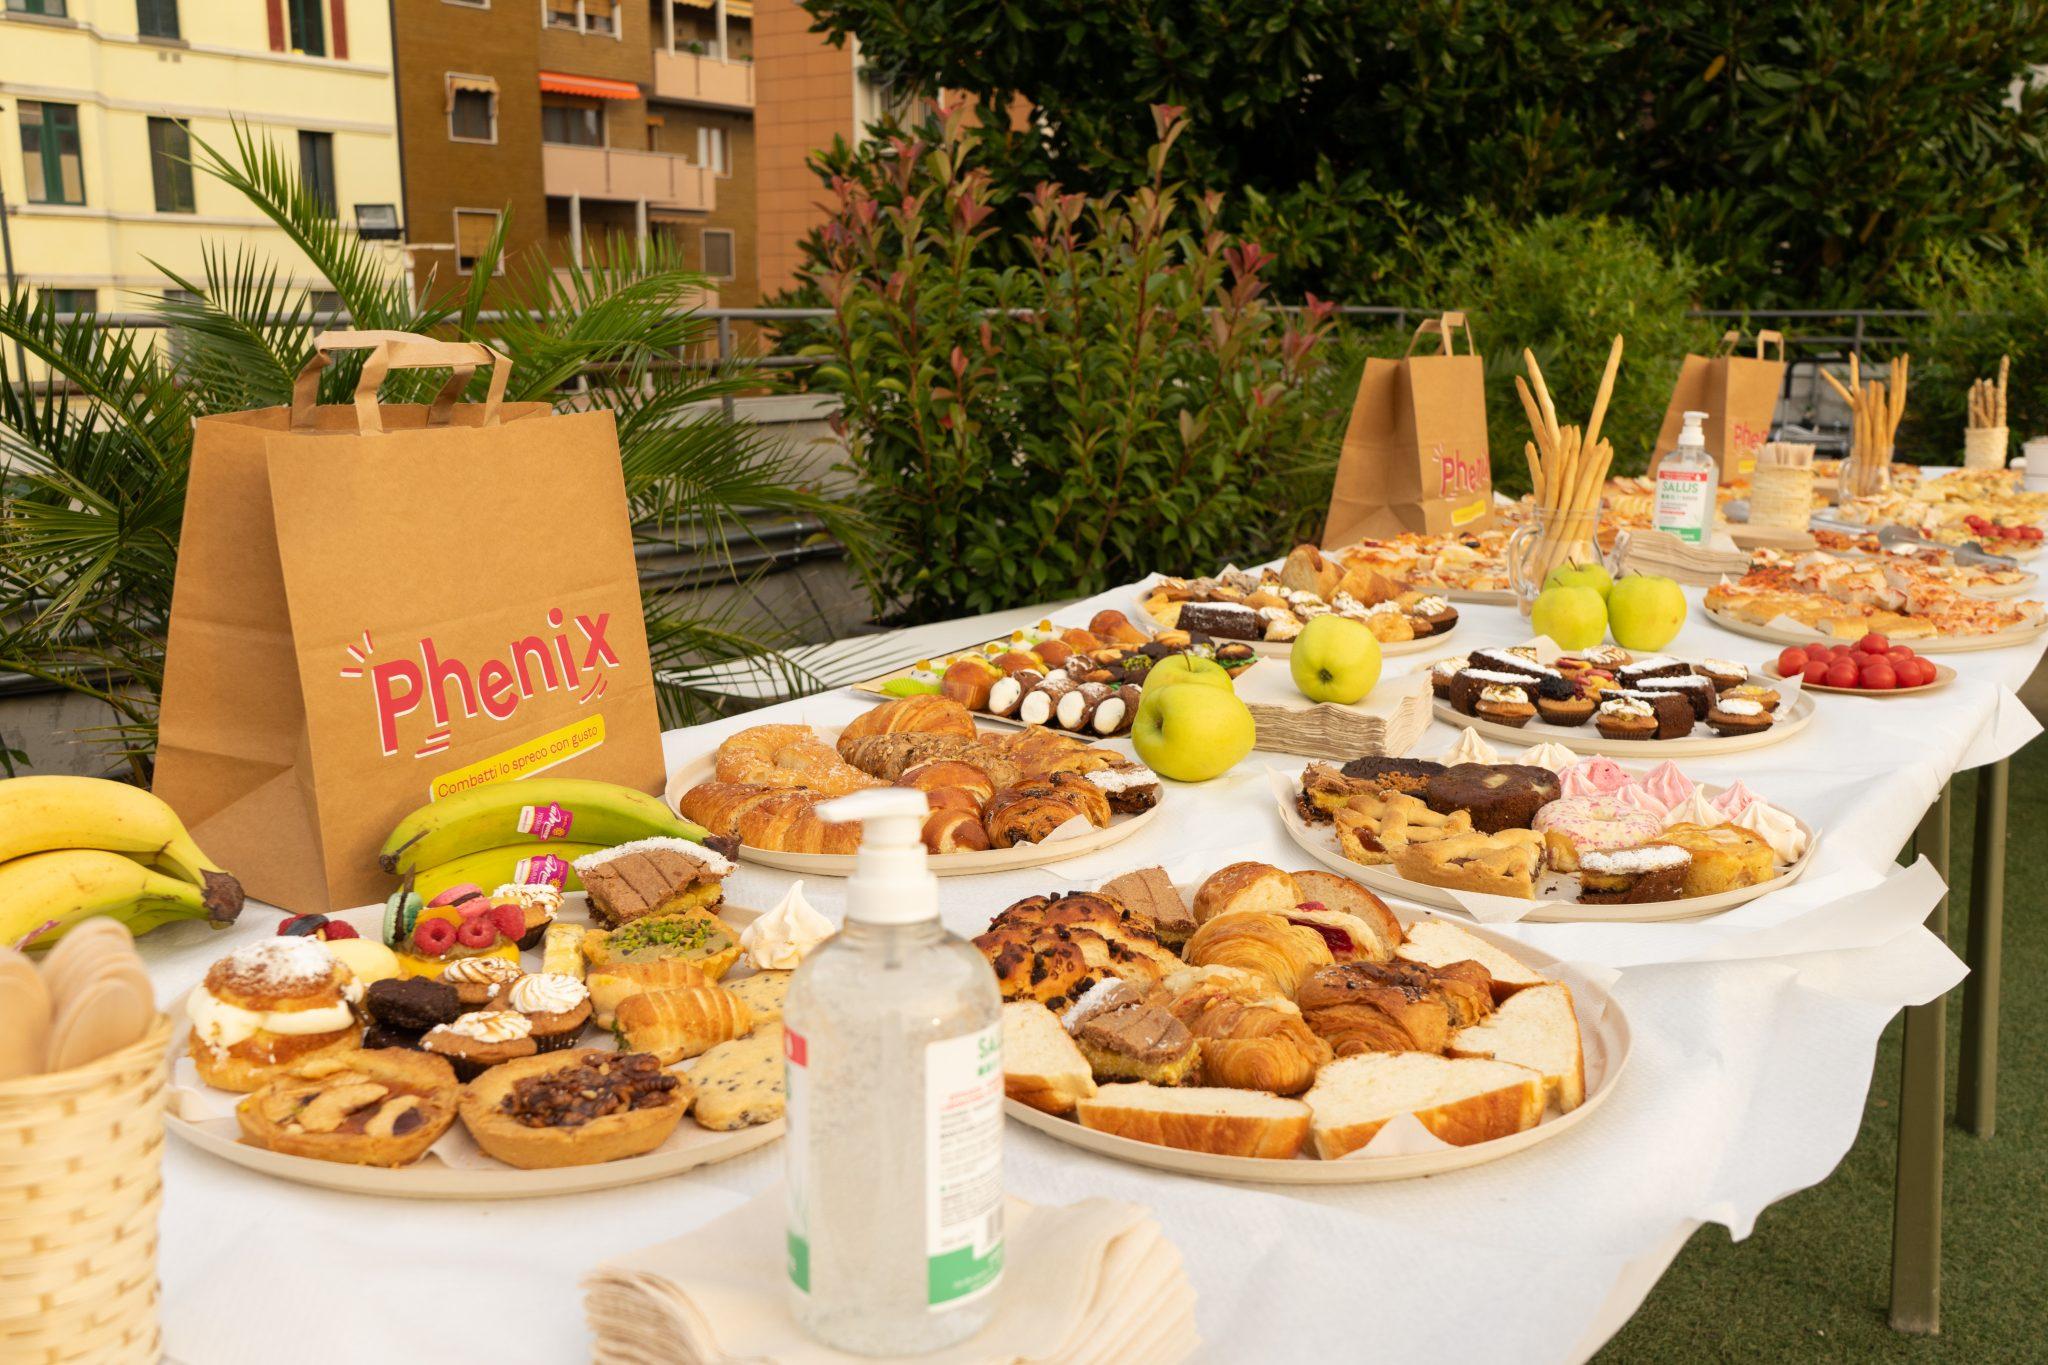 phenix app